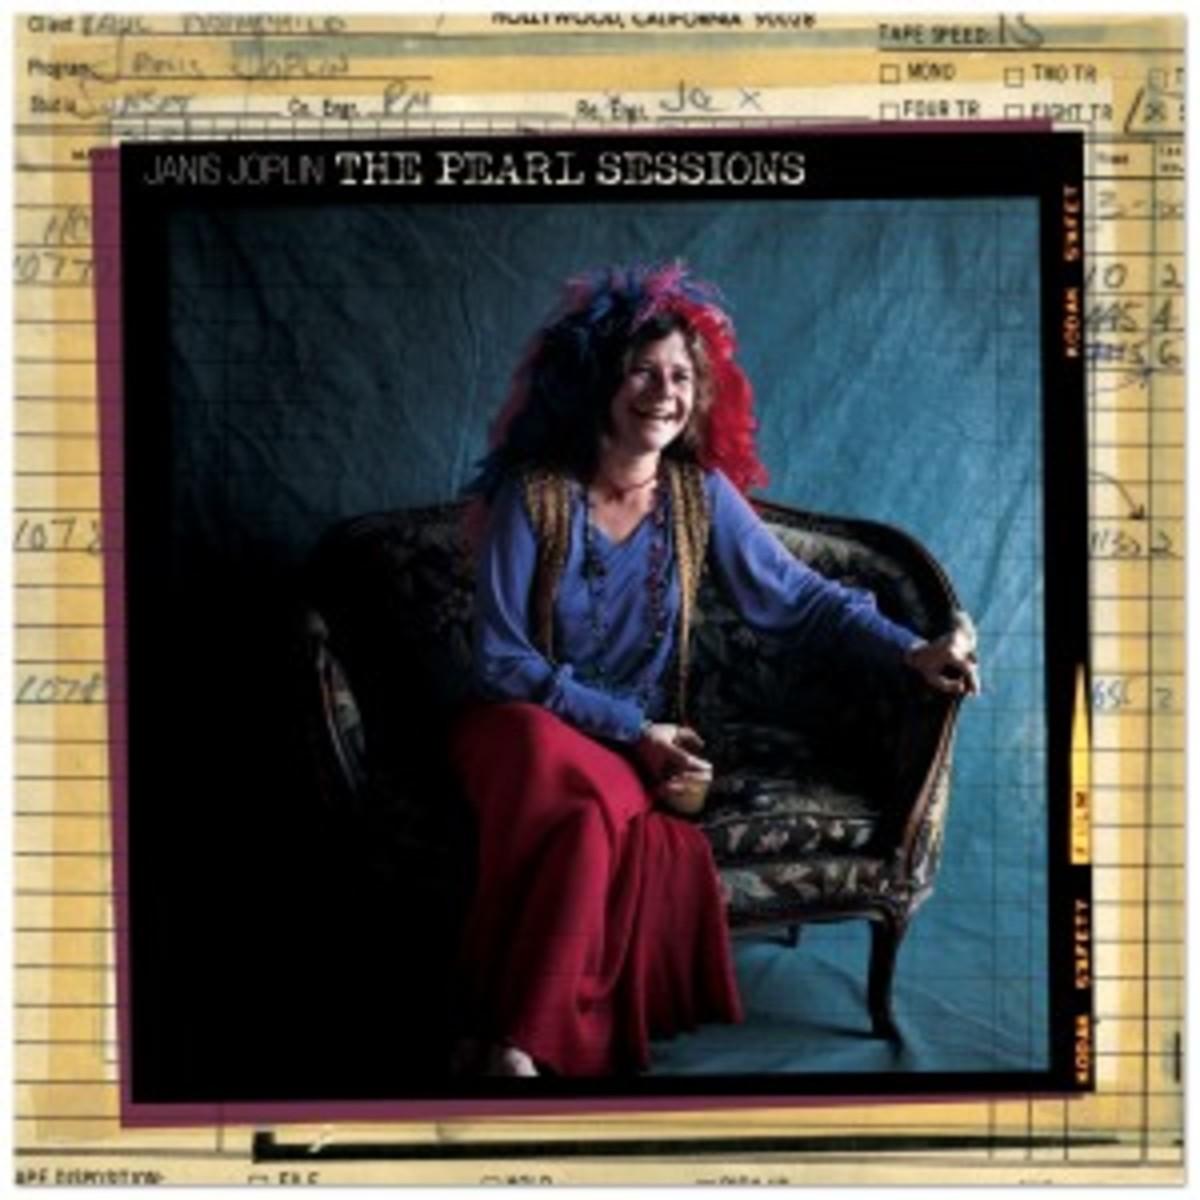 Janis Joplin The Pearl Sessions